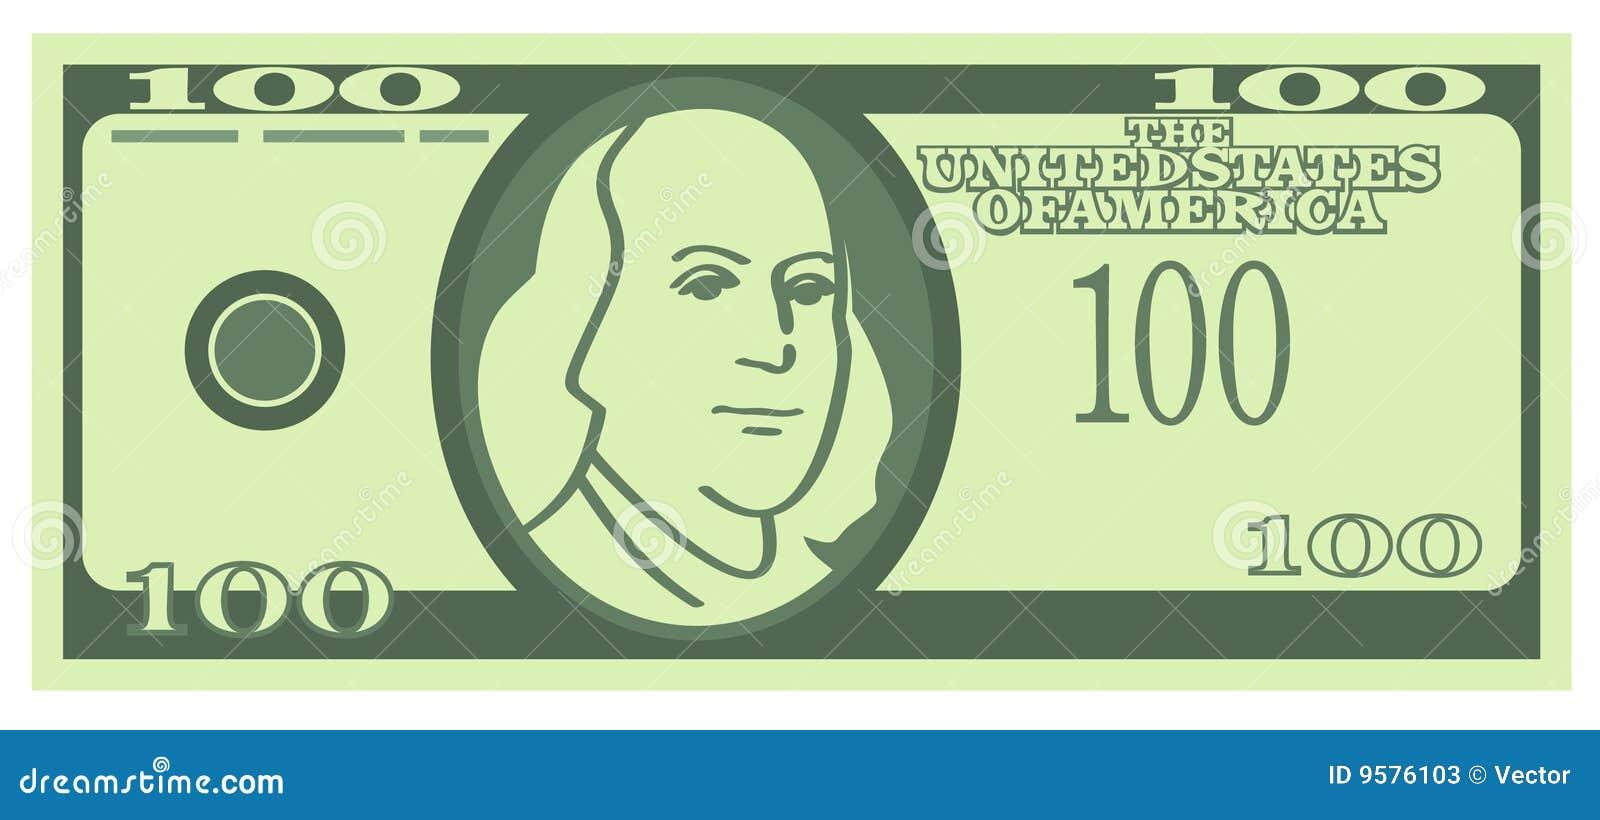 100 U.S. Dollars Banknote (Vector) Stock Photos